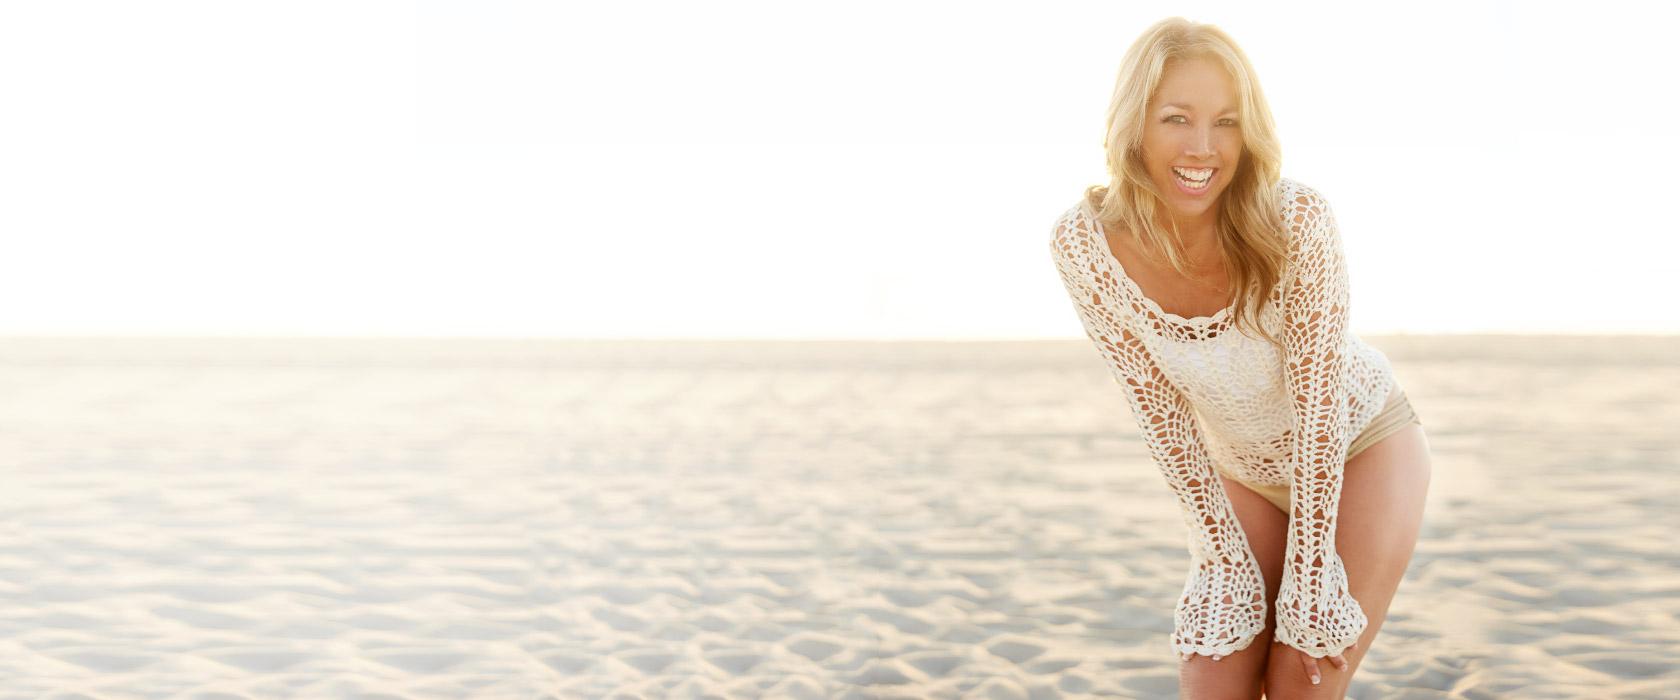 Denise Austin: Fitness Icon & This Week's Balanced Babe